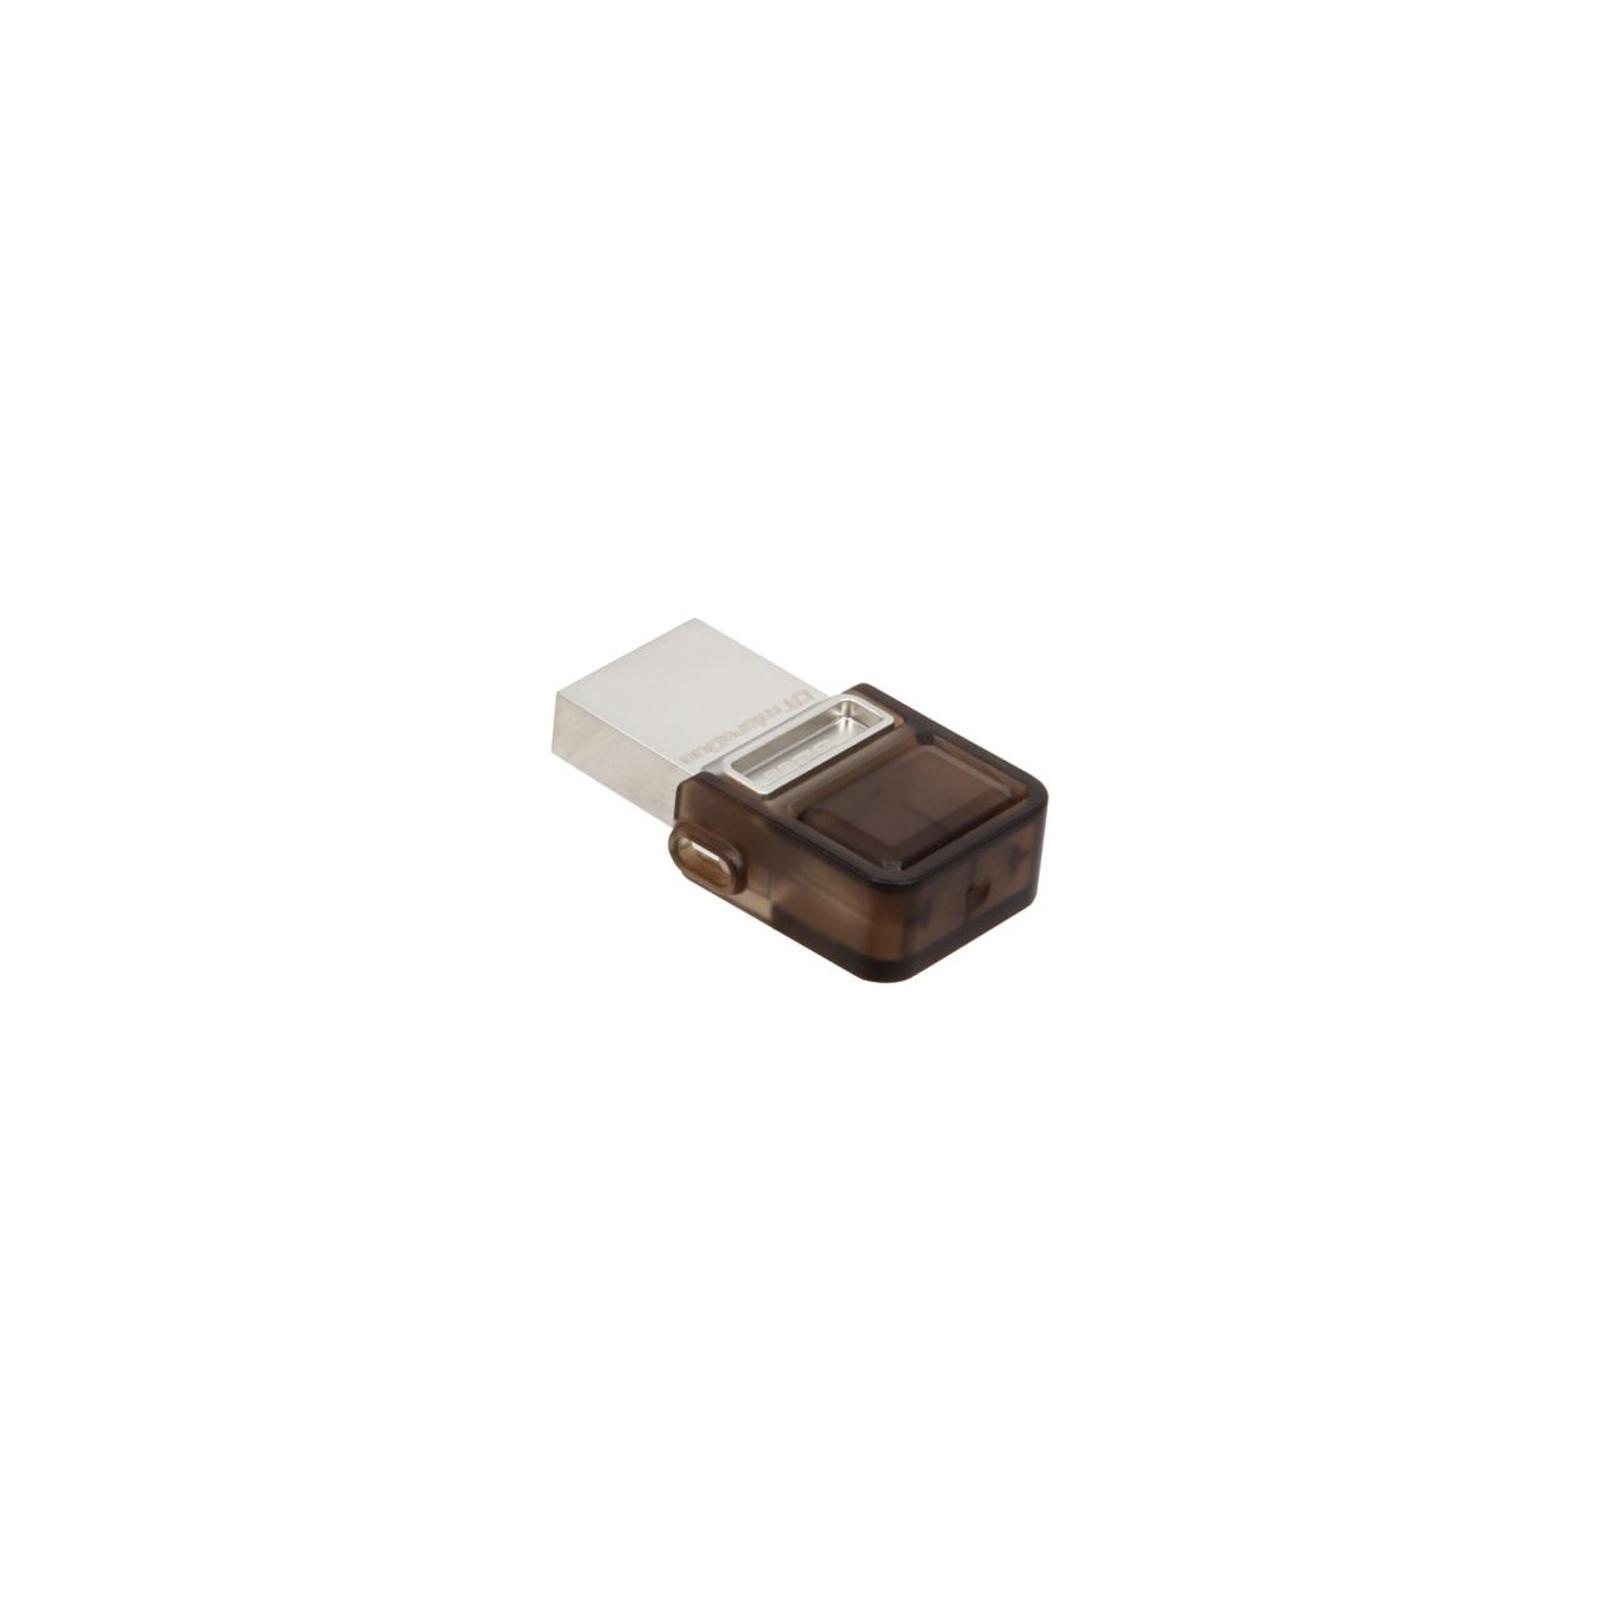 USB флеш накопитель Kingston 32Gb DT MicroDuo (DTDUO/32GB) изображение 2